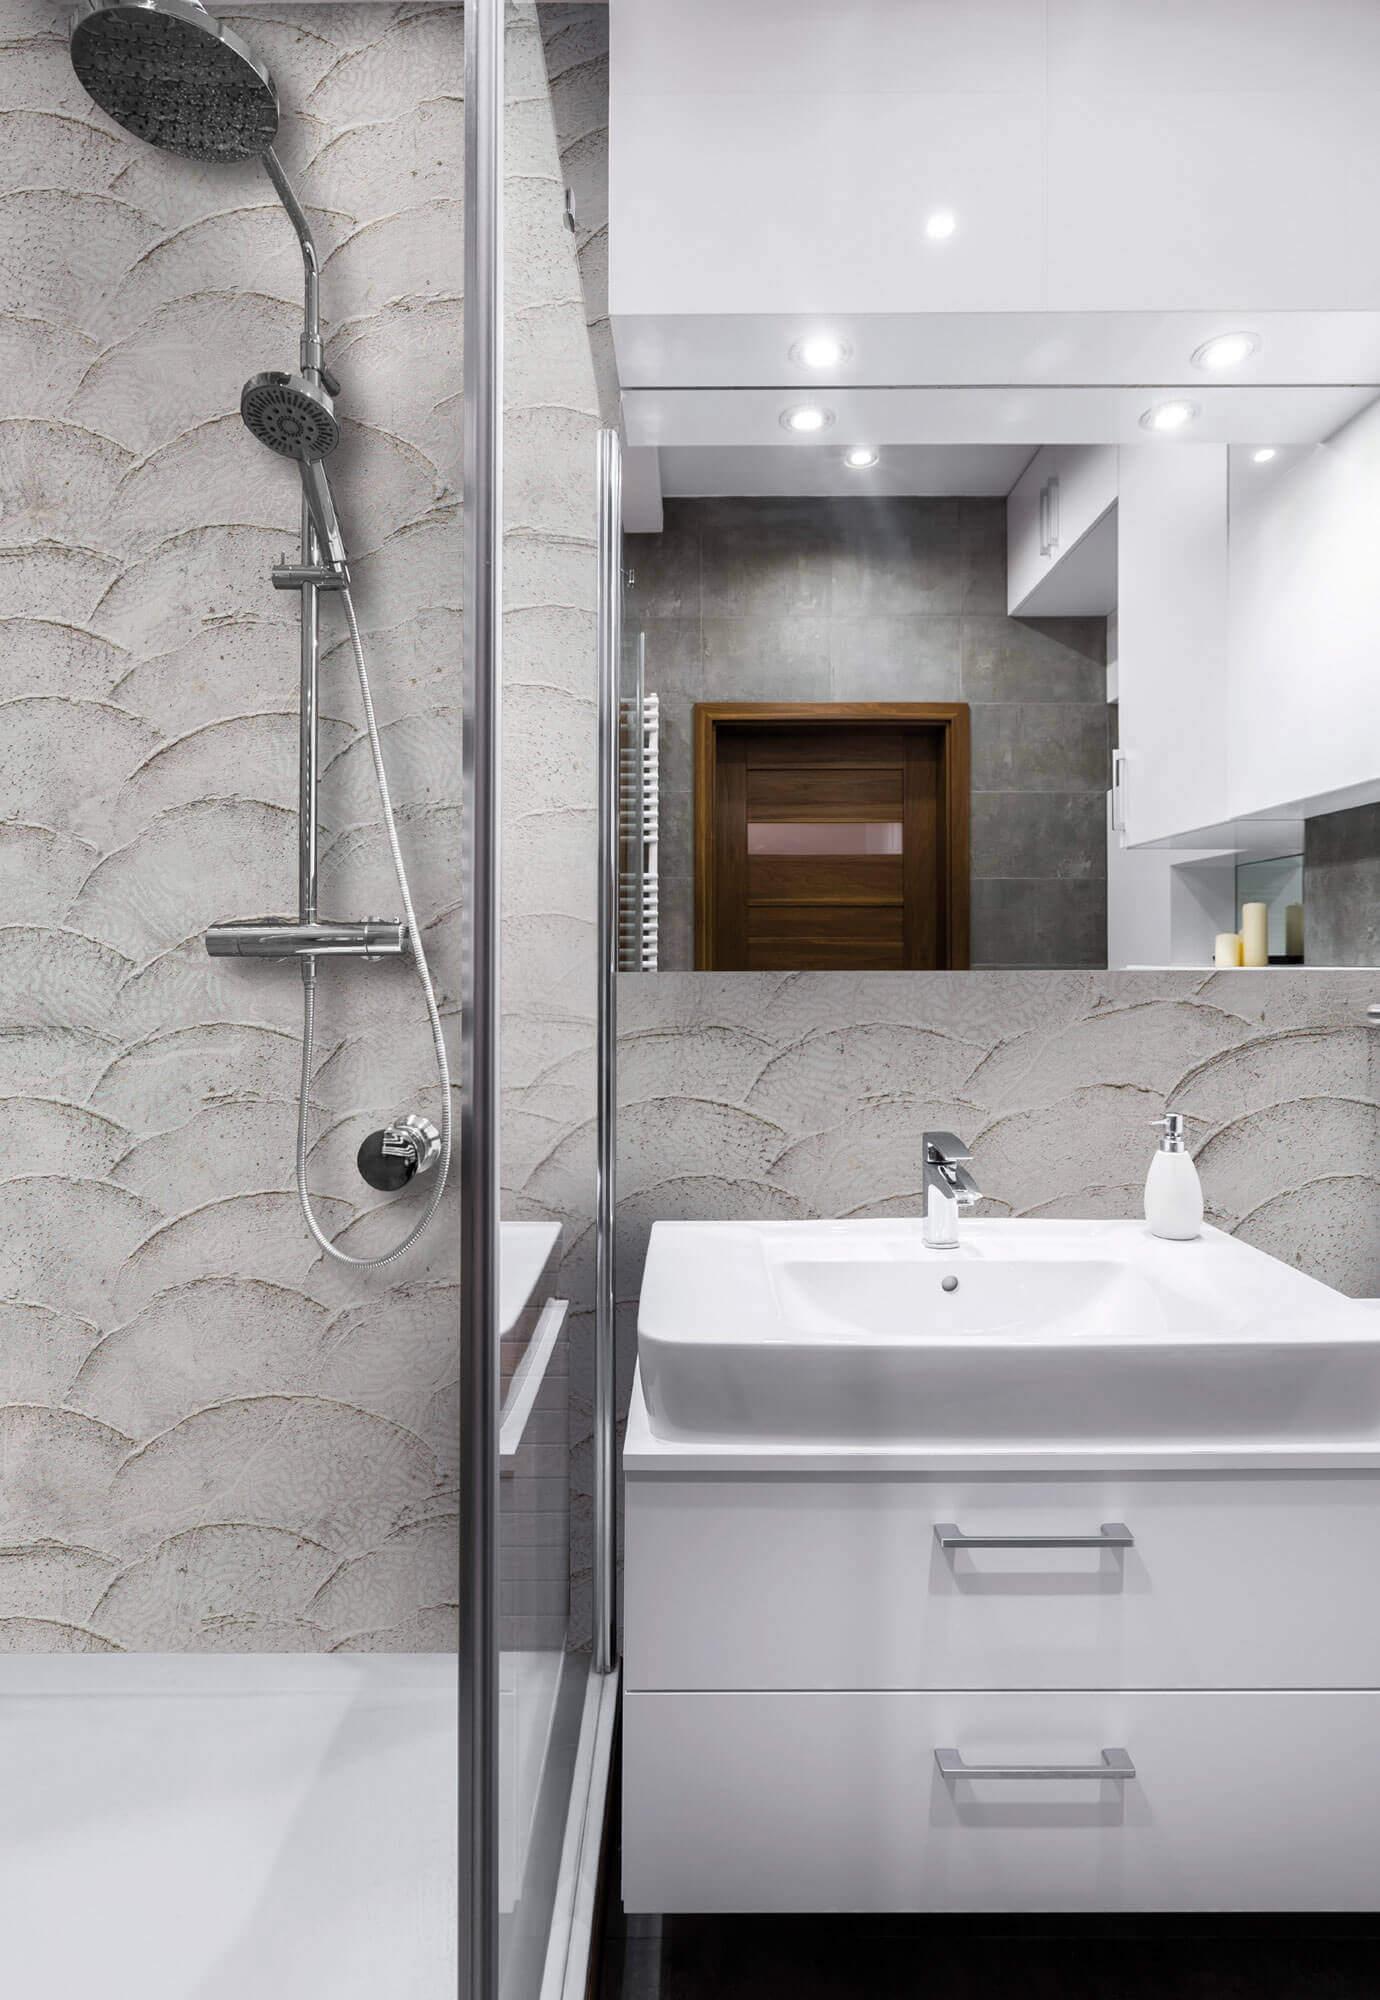 Tapeta pod prysznic imitująca beton Tecnografica 59135 Grey Sea